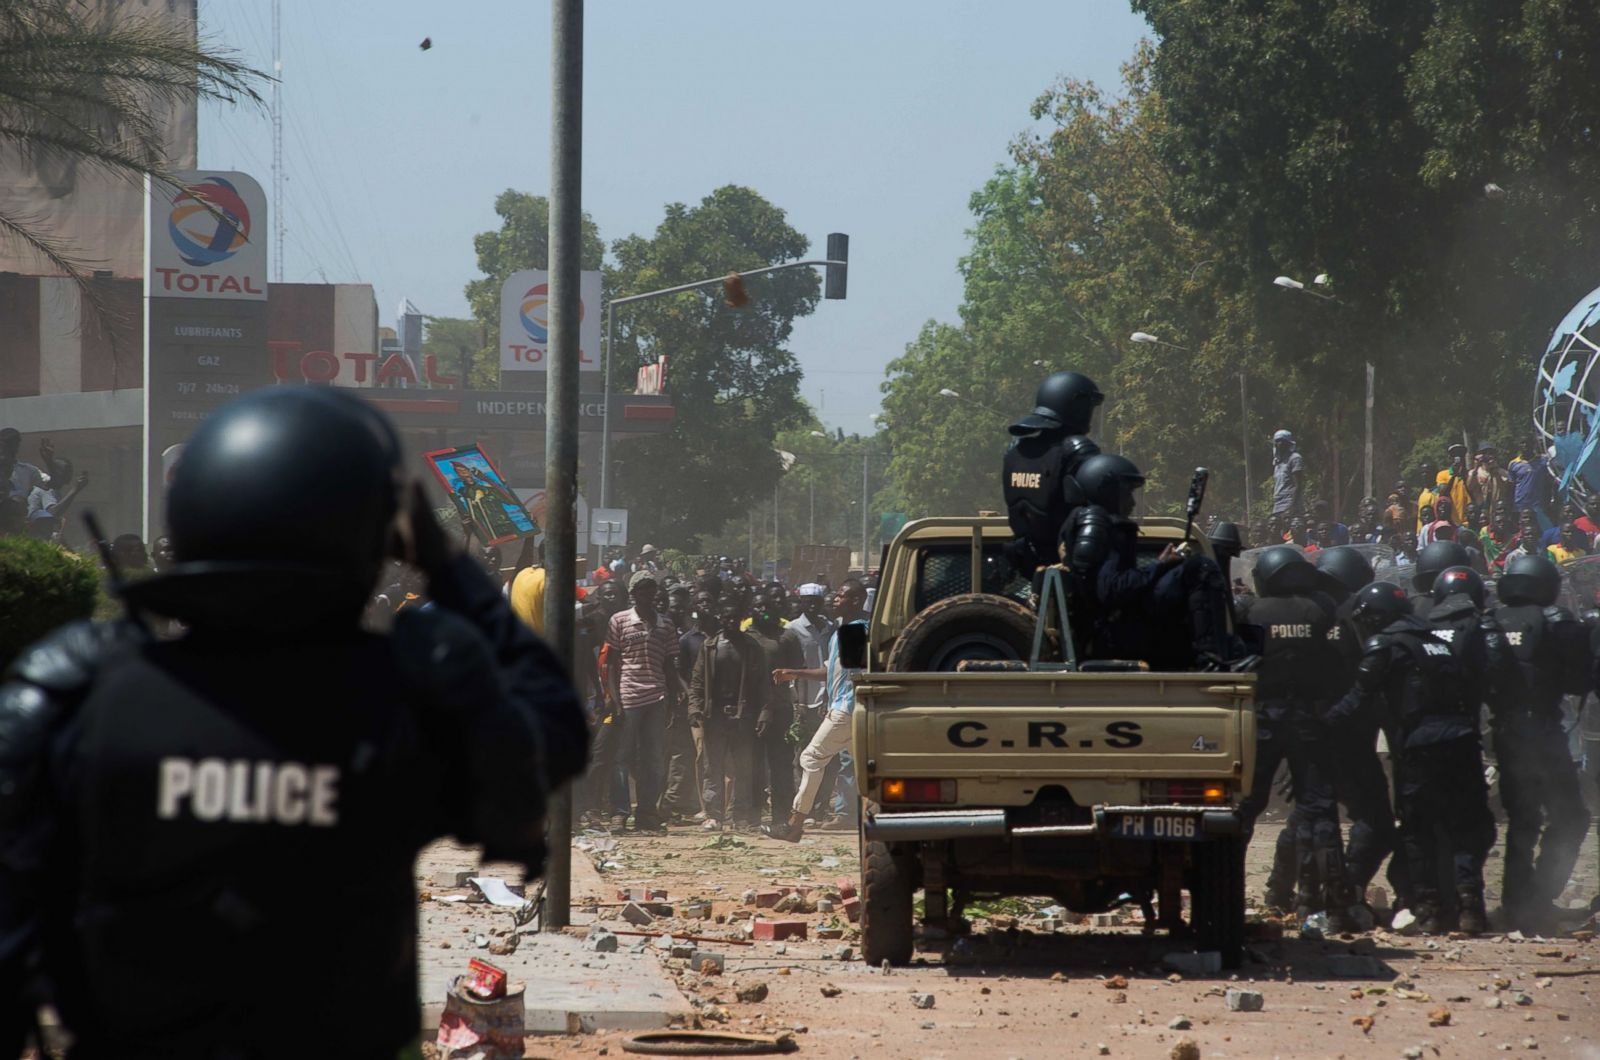 Burkina Faso Burns as Protesters Take Parliament Photos | Image #11 - ABC  News